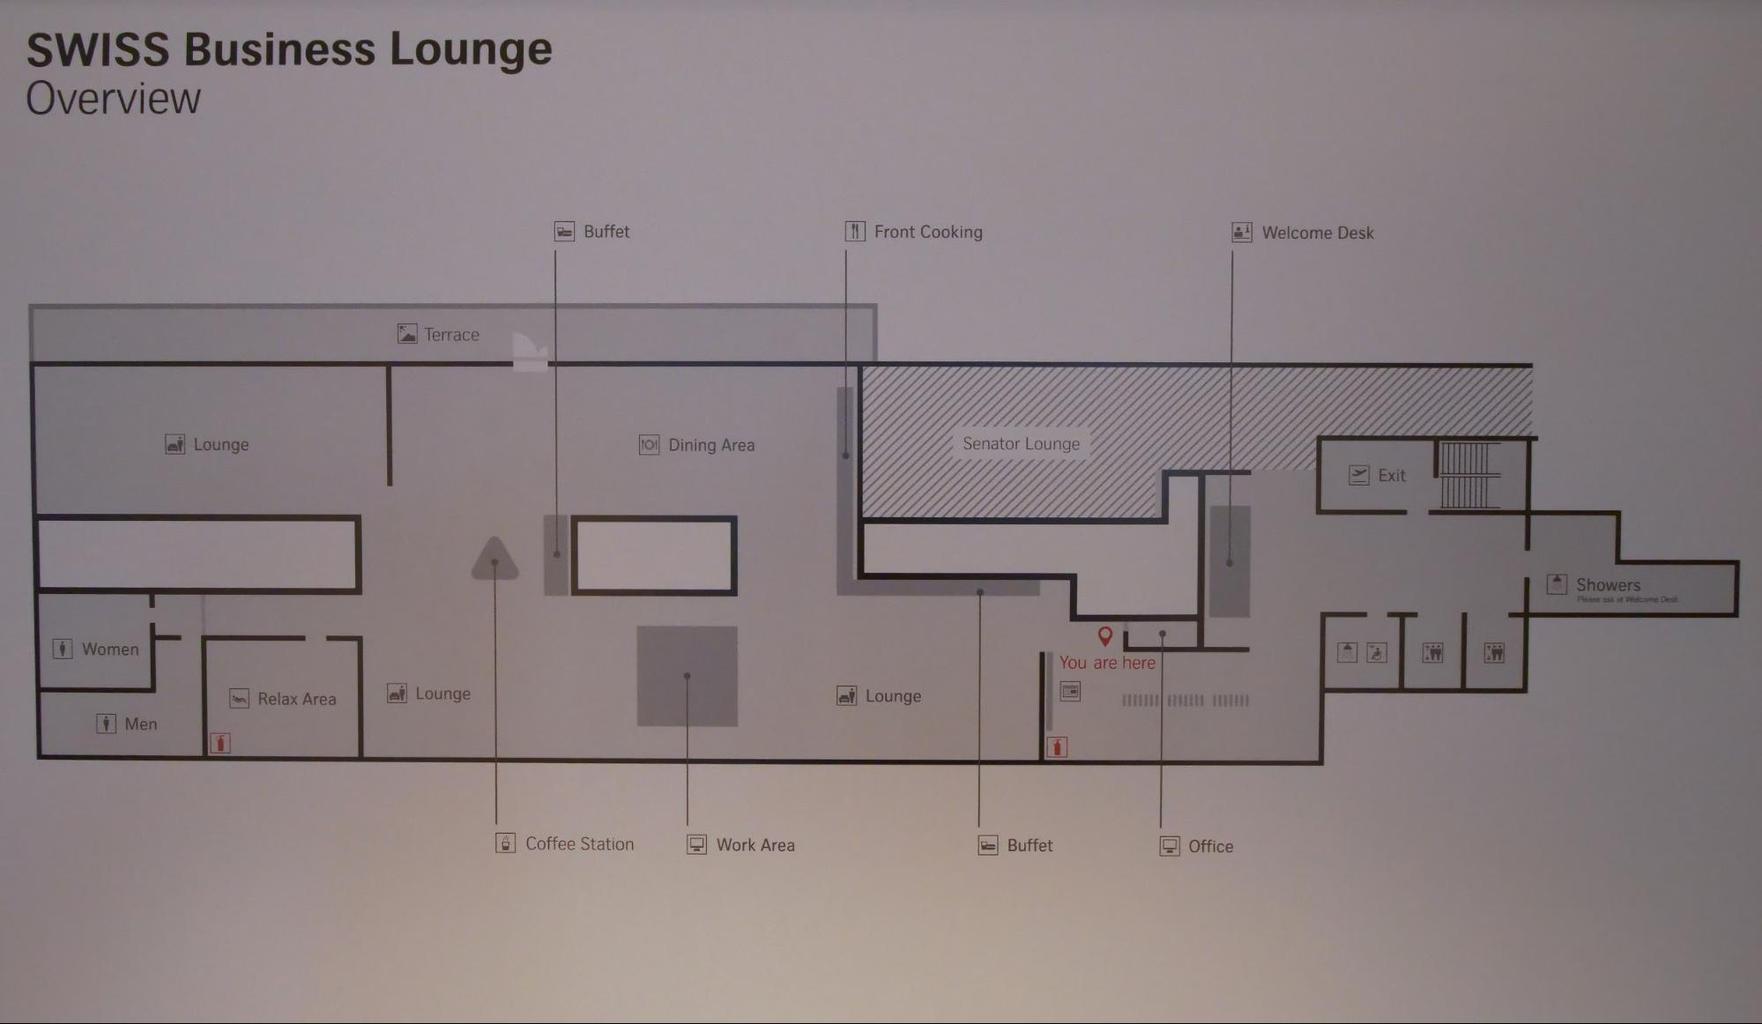 Floor plan of Swiss Business Class lounge at Zurich airport